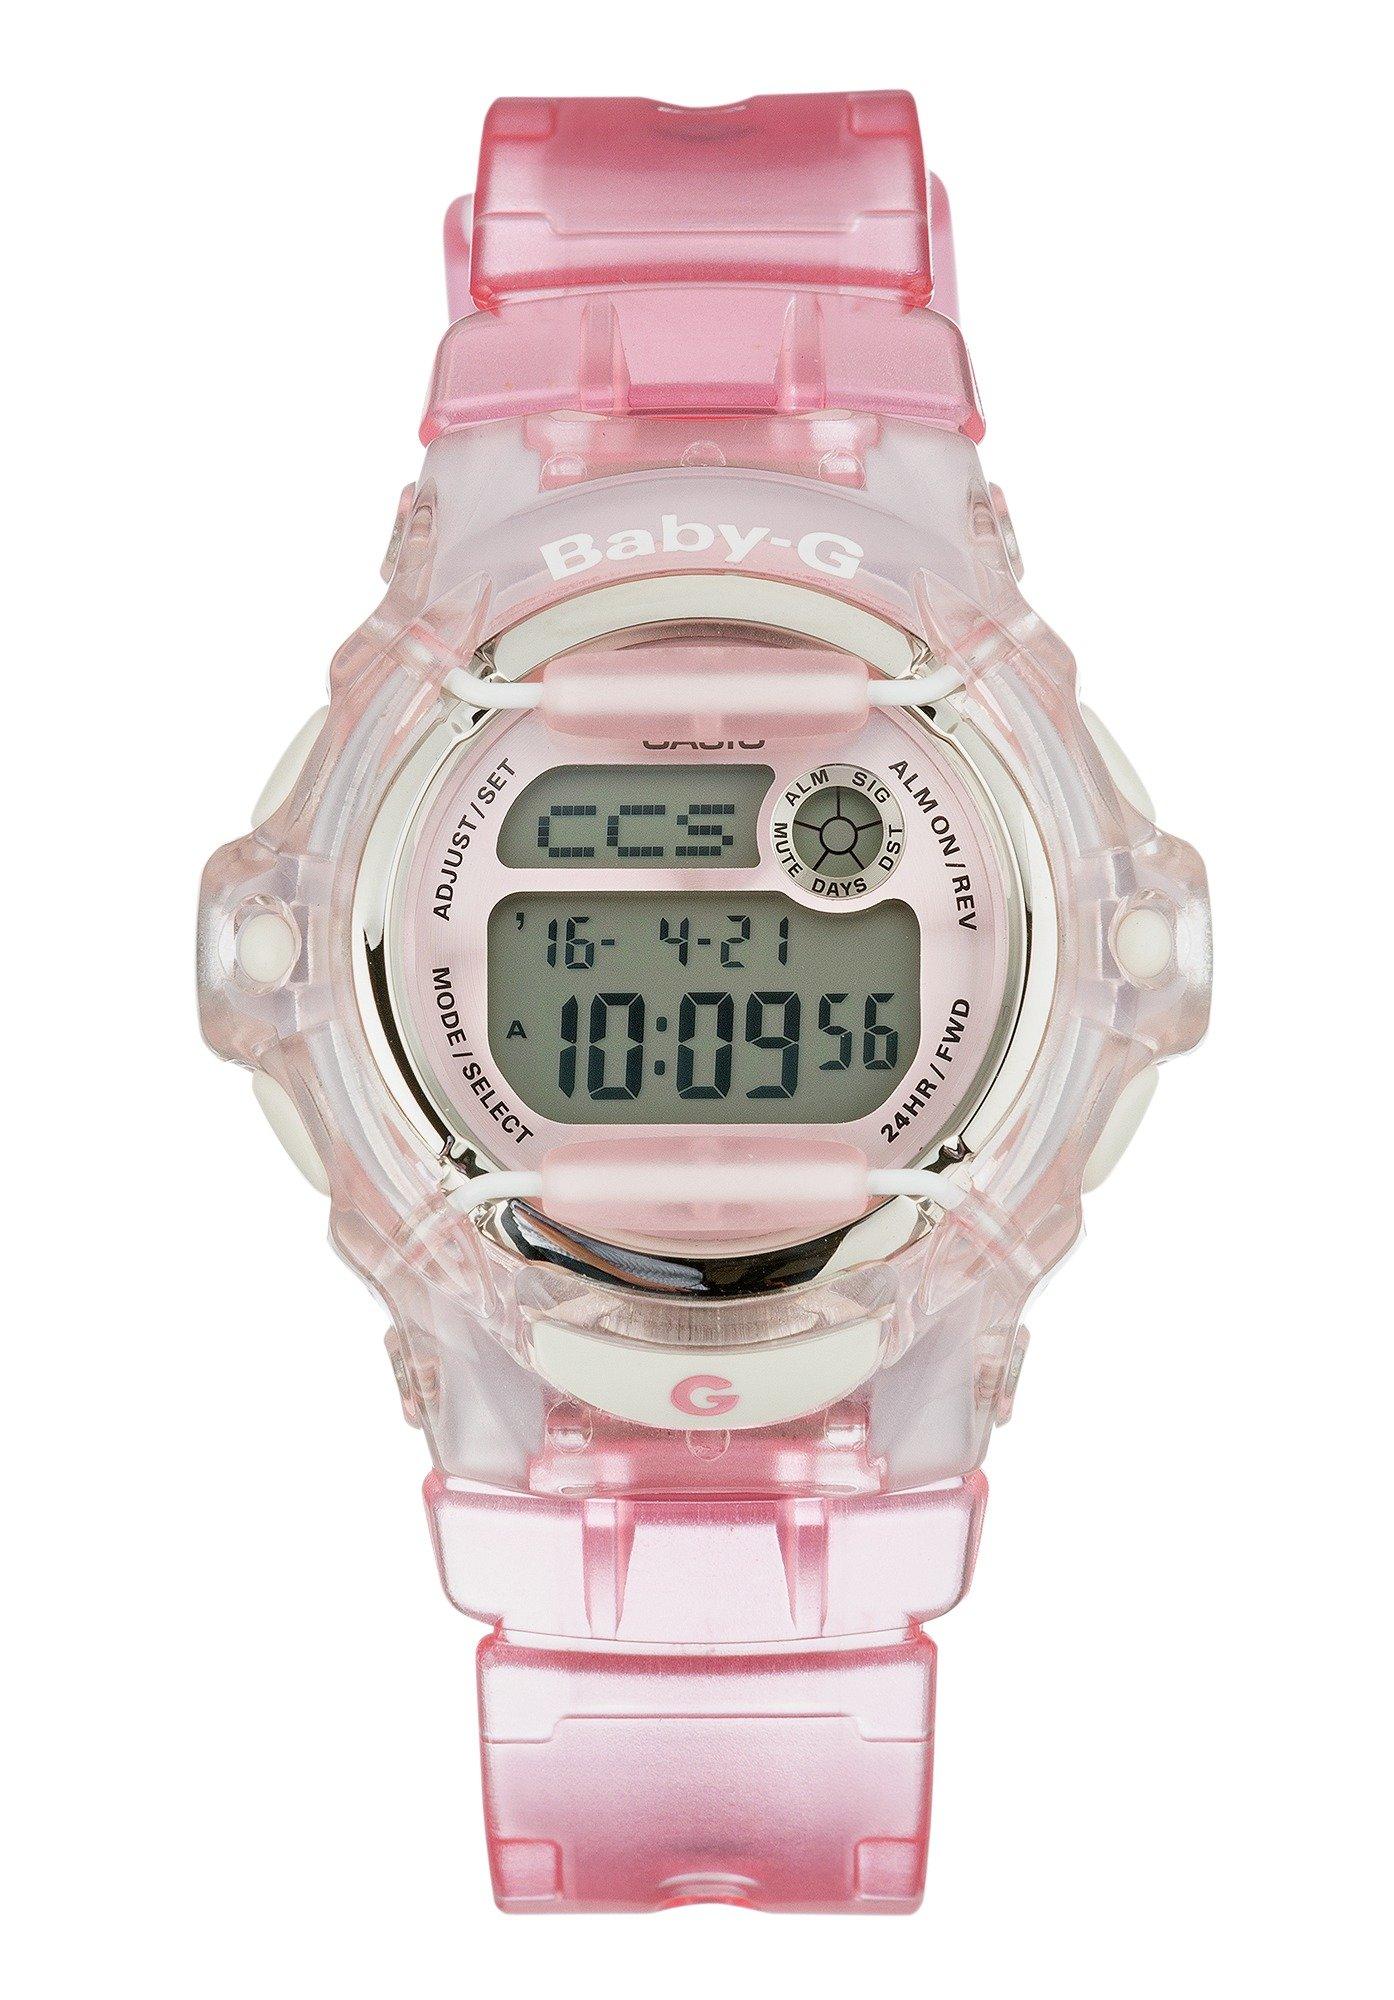 Casio Baby-G BG-169R-4ER World Time Telememo Digital Watch